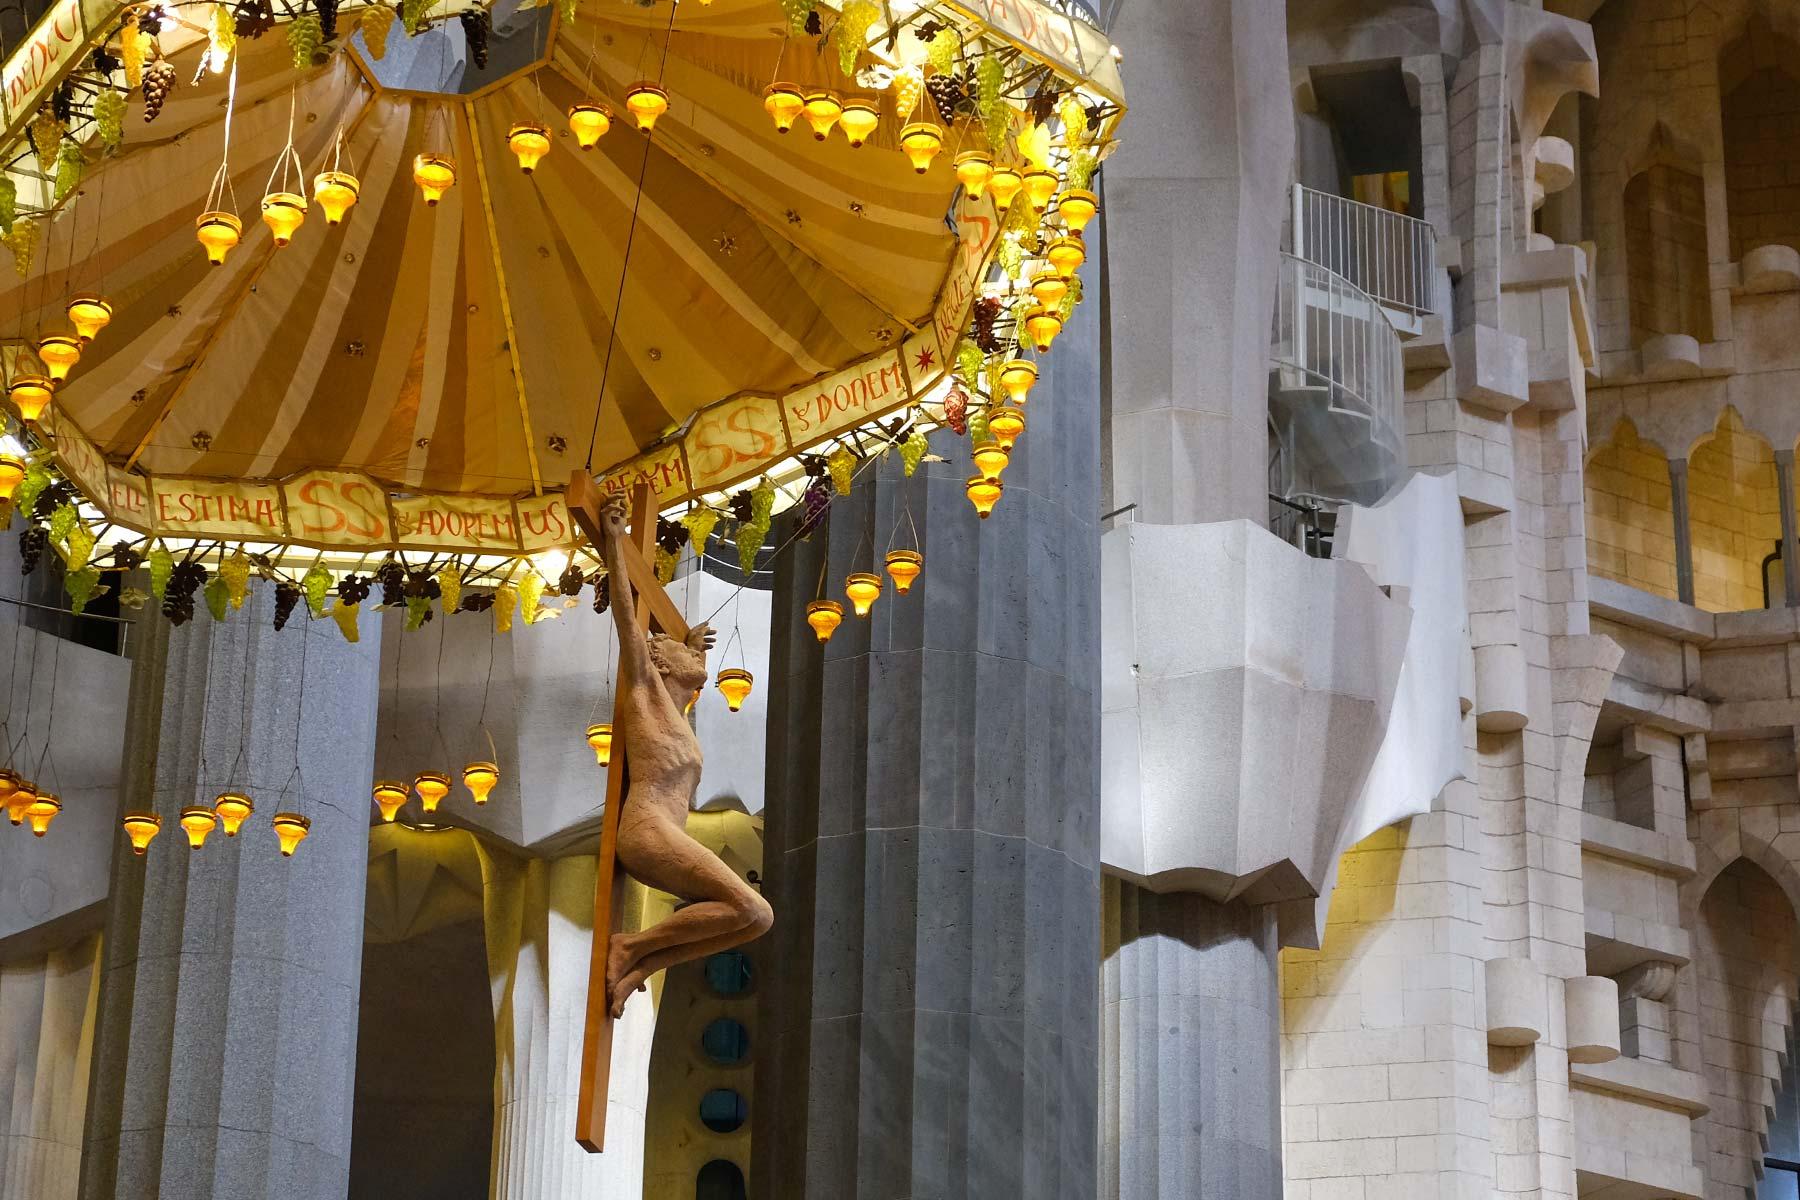 Jesus am Kreuz in der Sagrada Familia von Antoni Gaudi in Barcelona